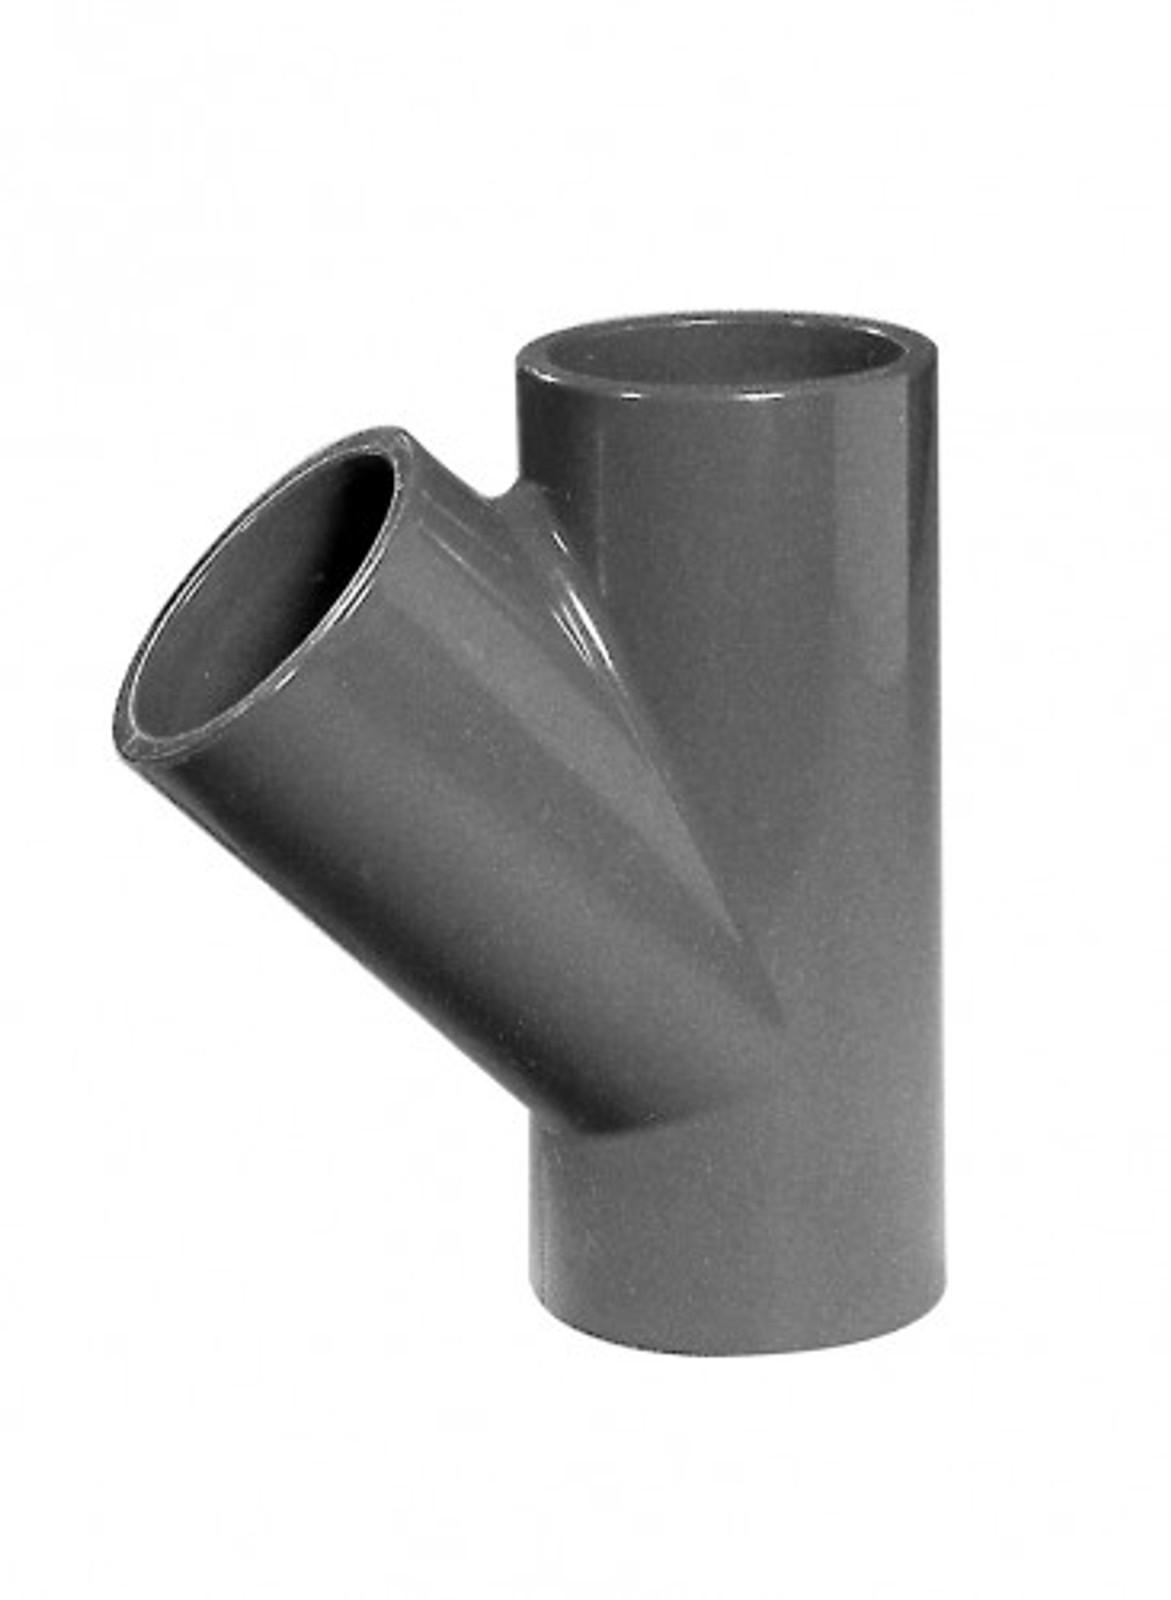 T-Stück 45°, 50 mm aus PVC